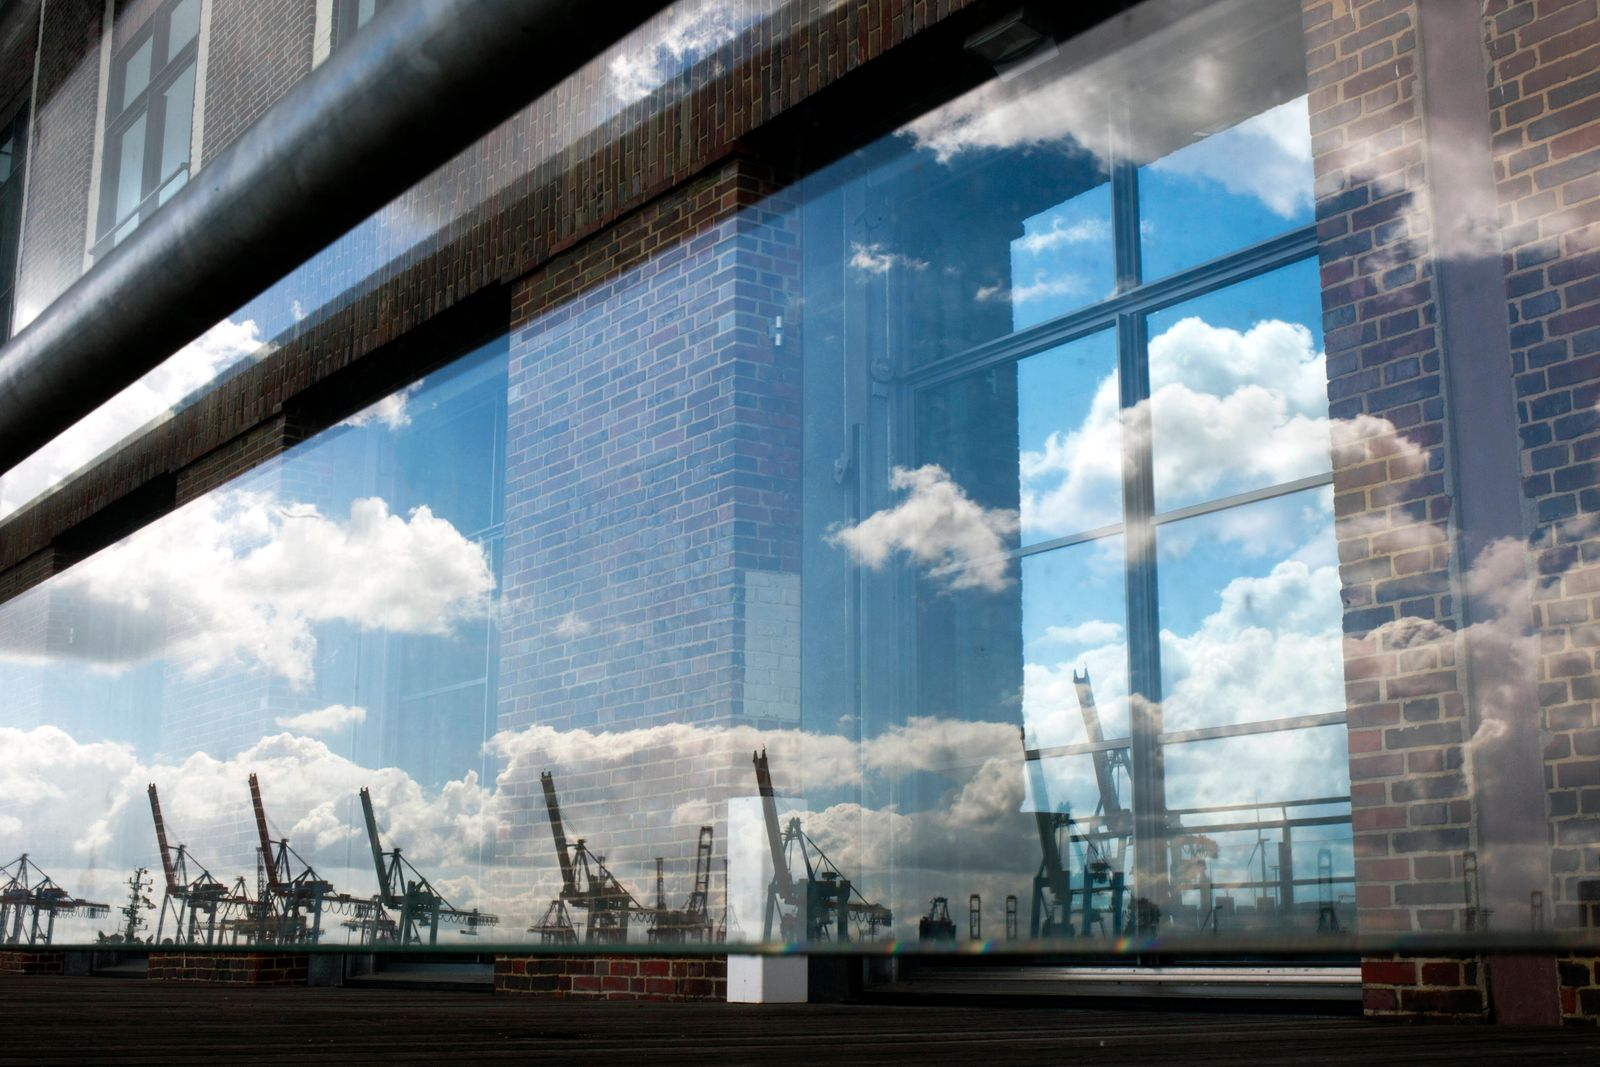 Hamburg Hafen General view of the port in Hamburg, Germany on June 12, 2021.